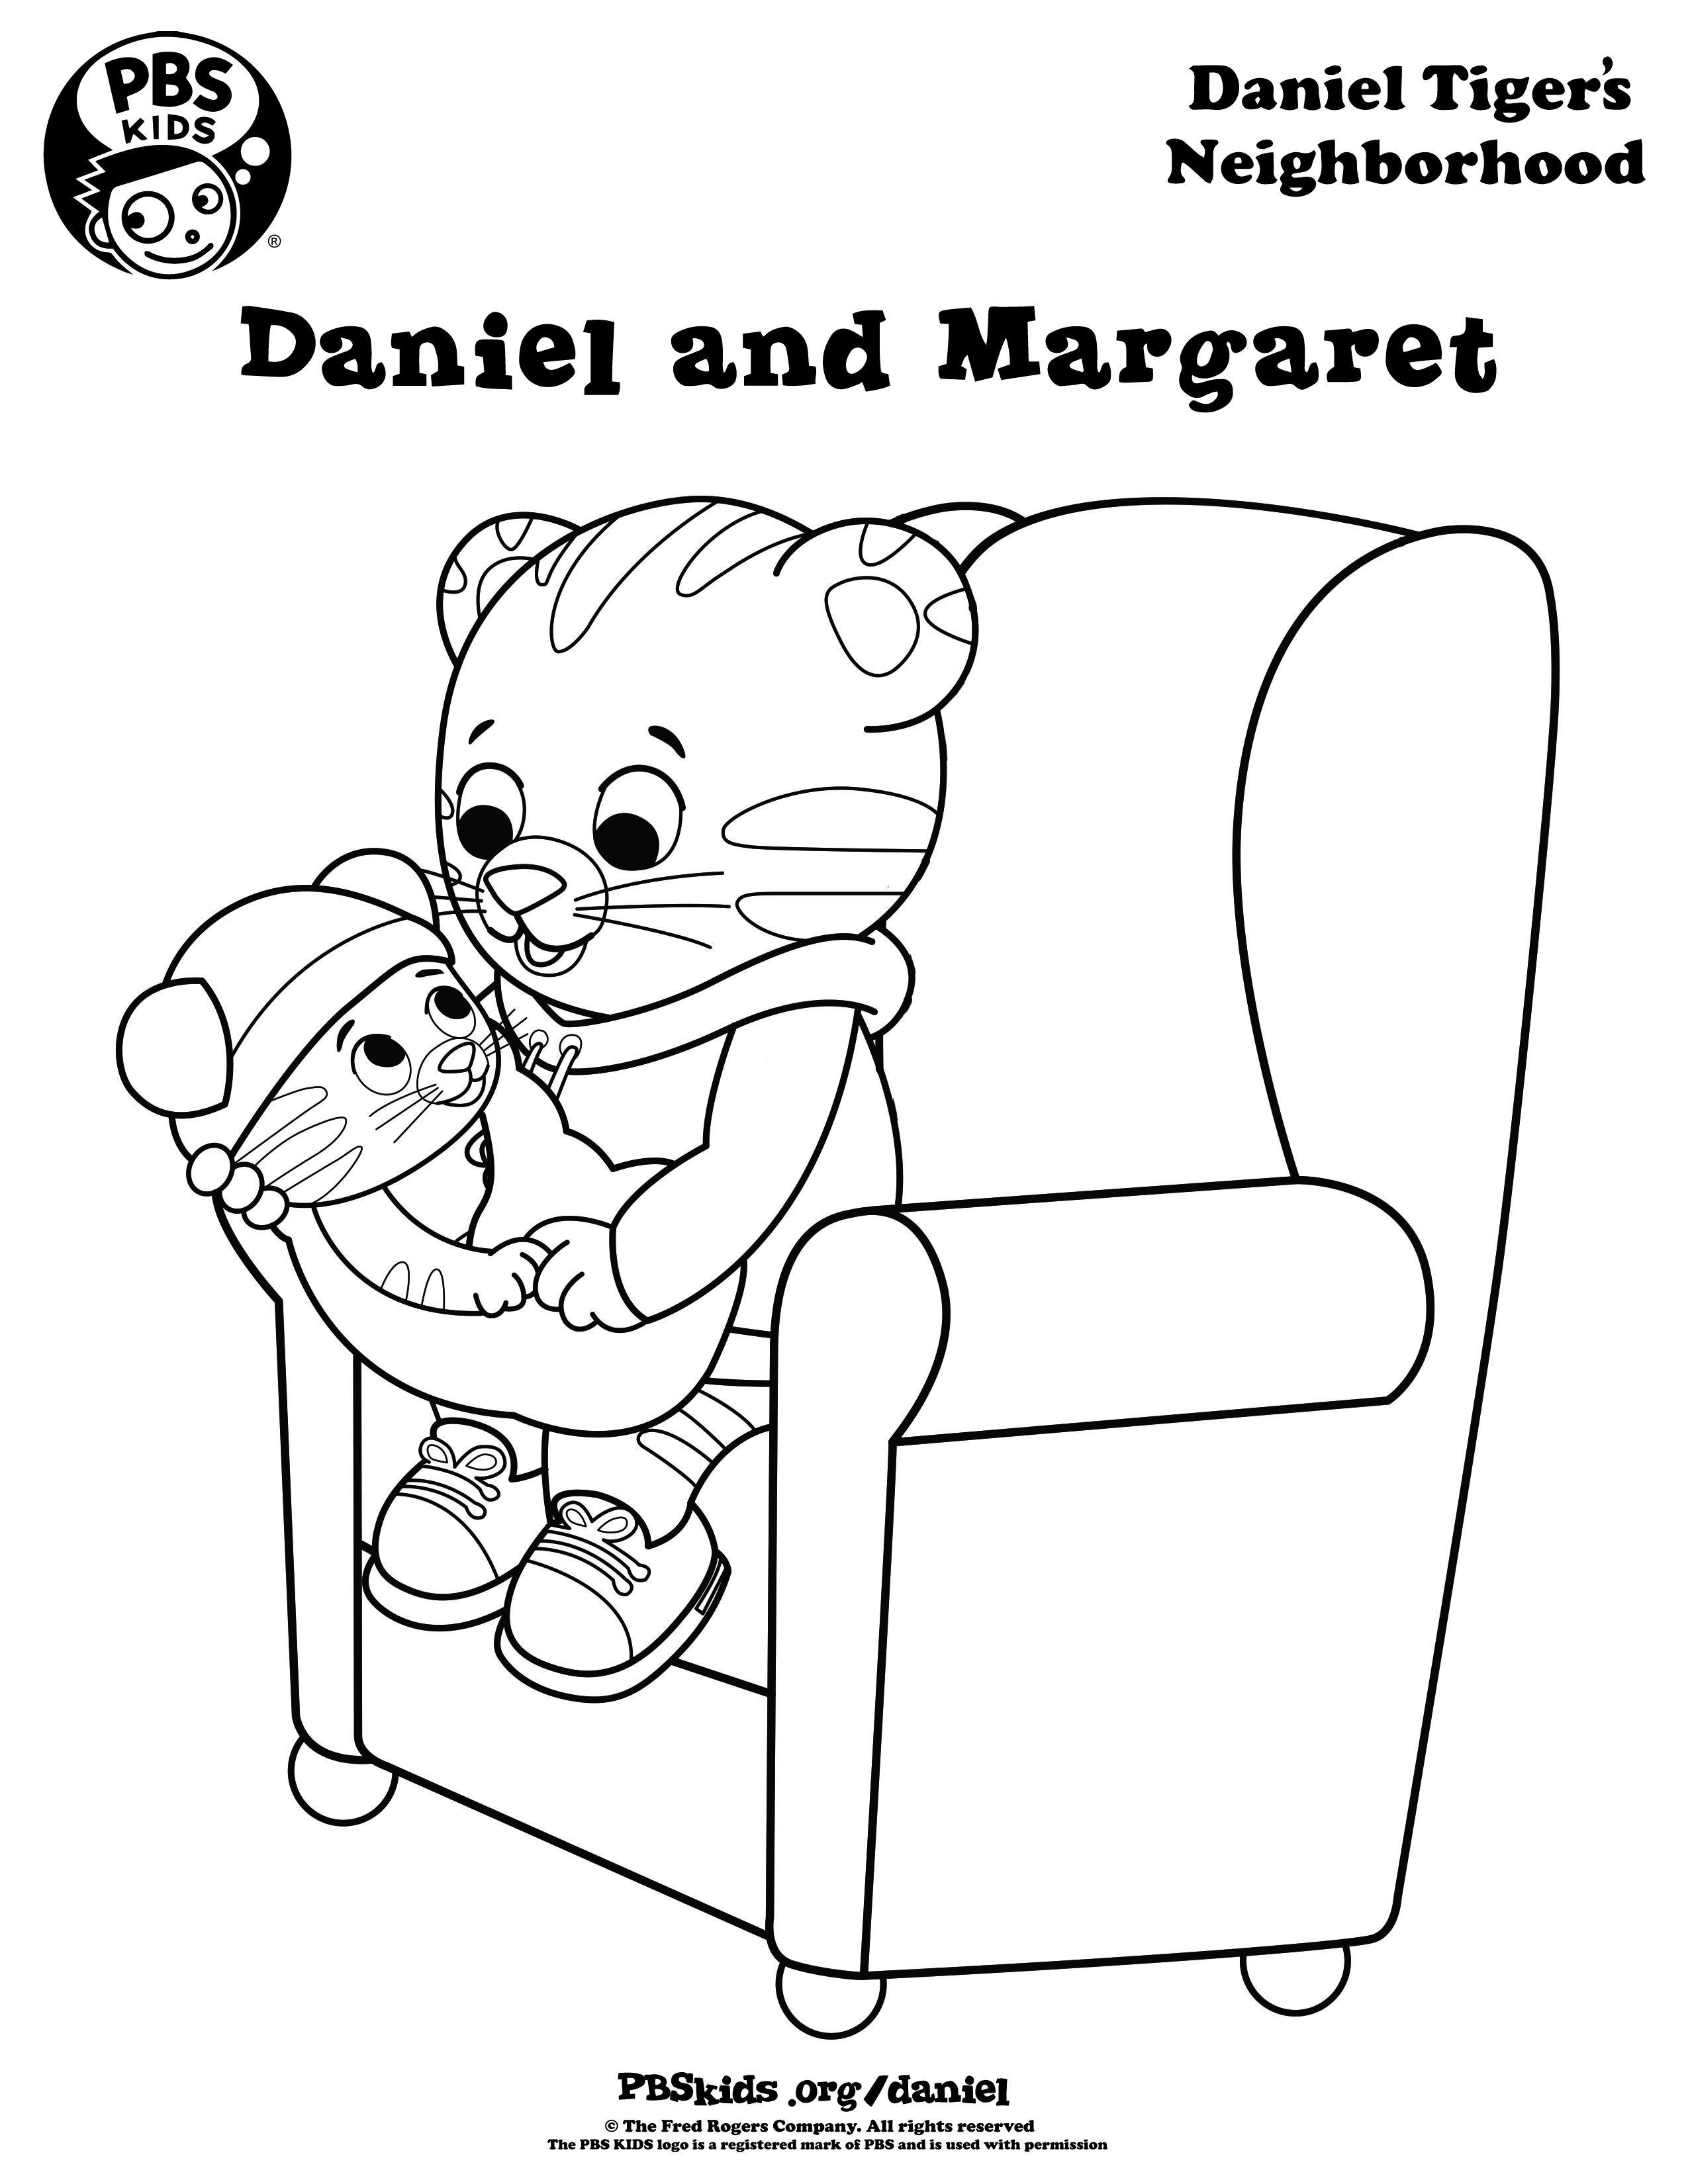 Coloring | Daniel Tiger's Neighborhood | Pbs Kids | Pbs